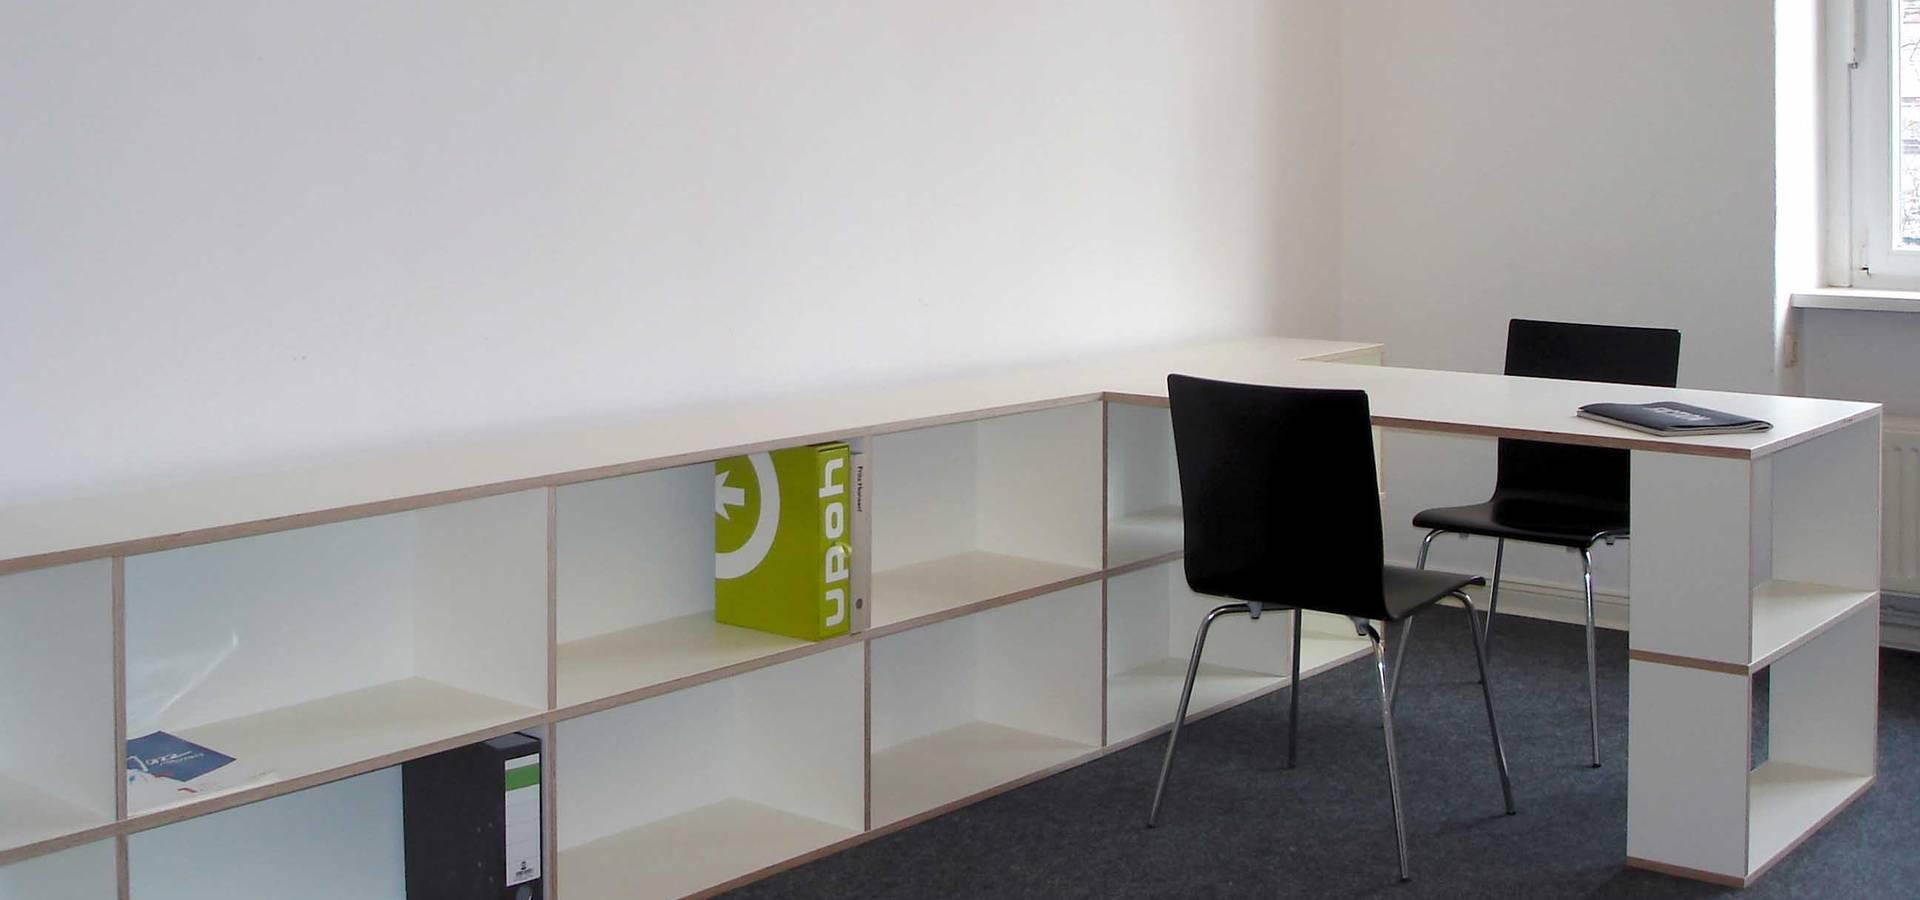 pirouette m belsysteme designer in schwerin homify. Black Bedroom Furniture Sets. Home Design Ideas